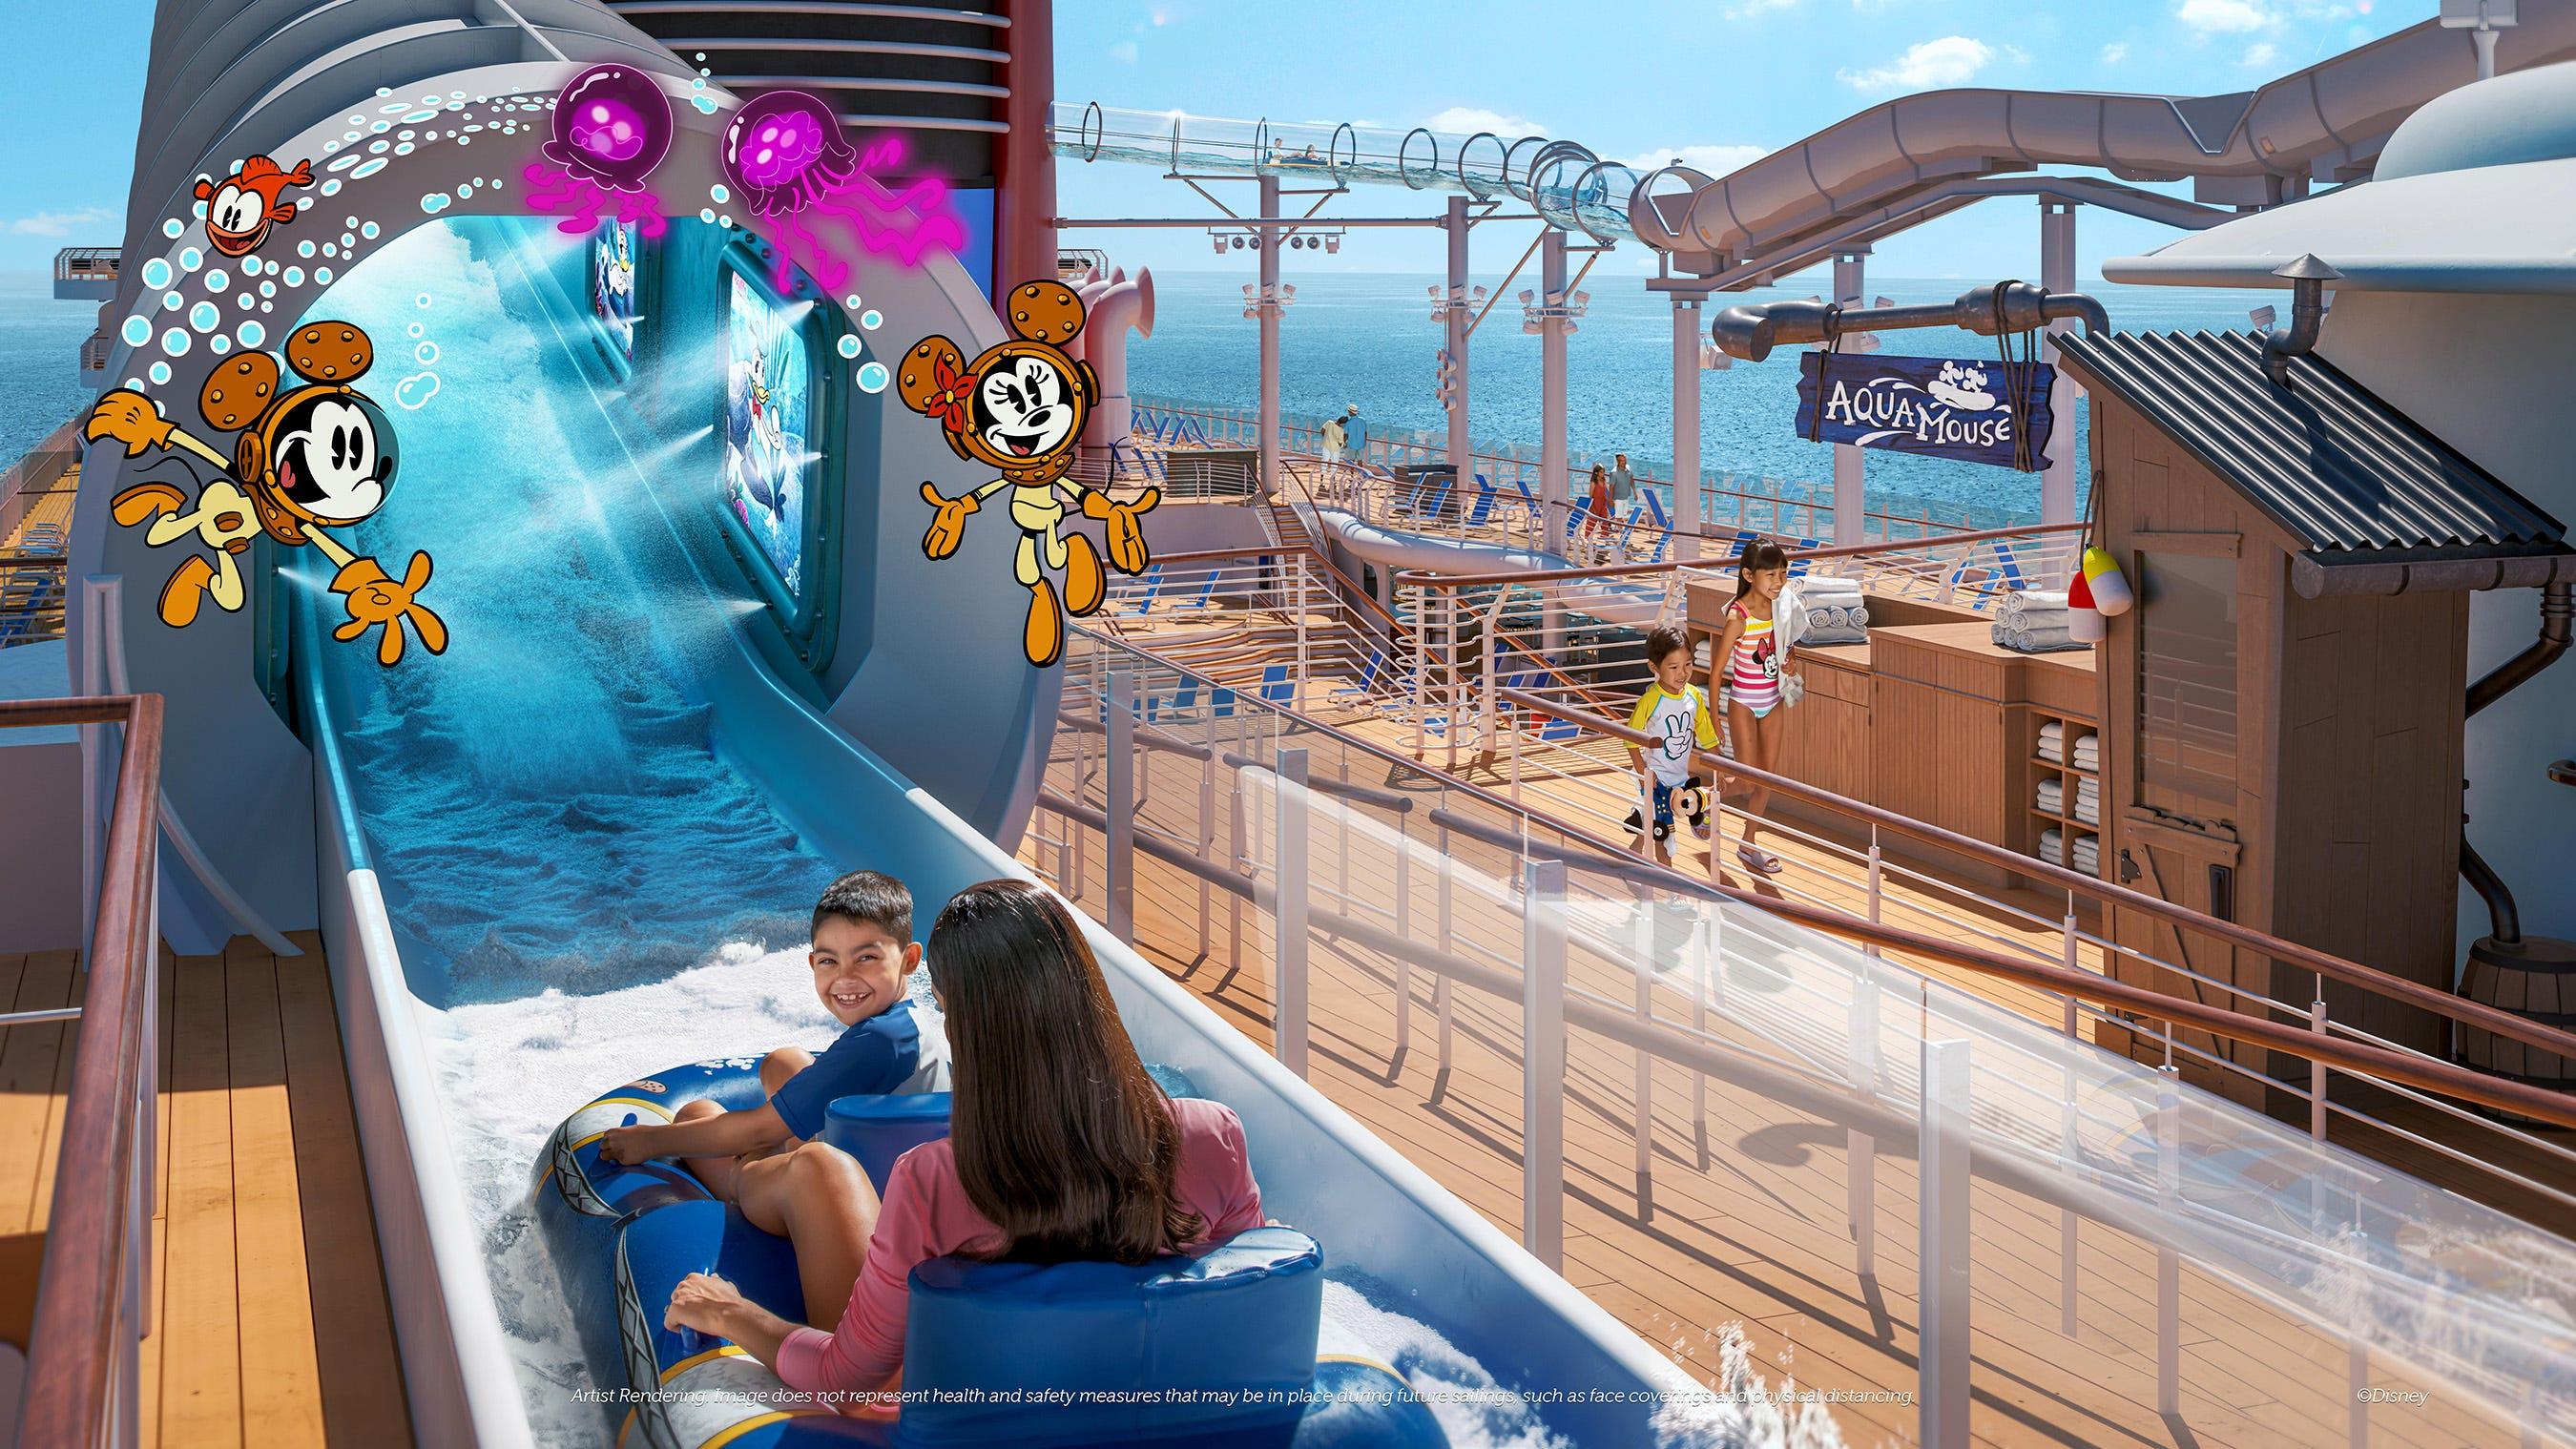 Disney Wish: A look inside Disney Cruise Line's newest ship